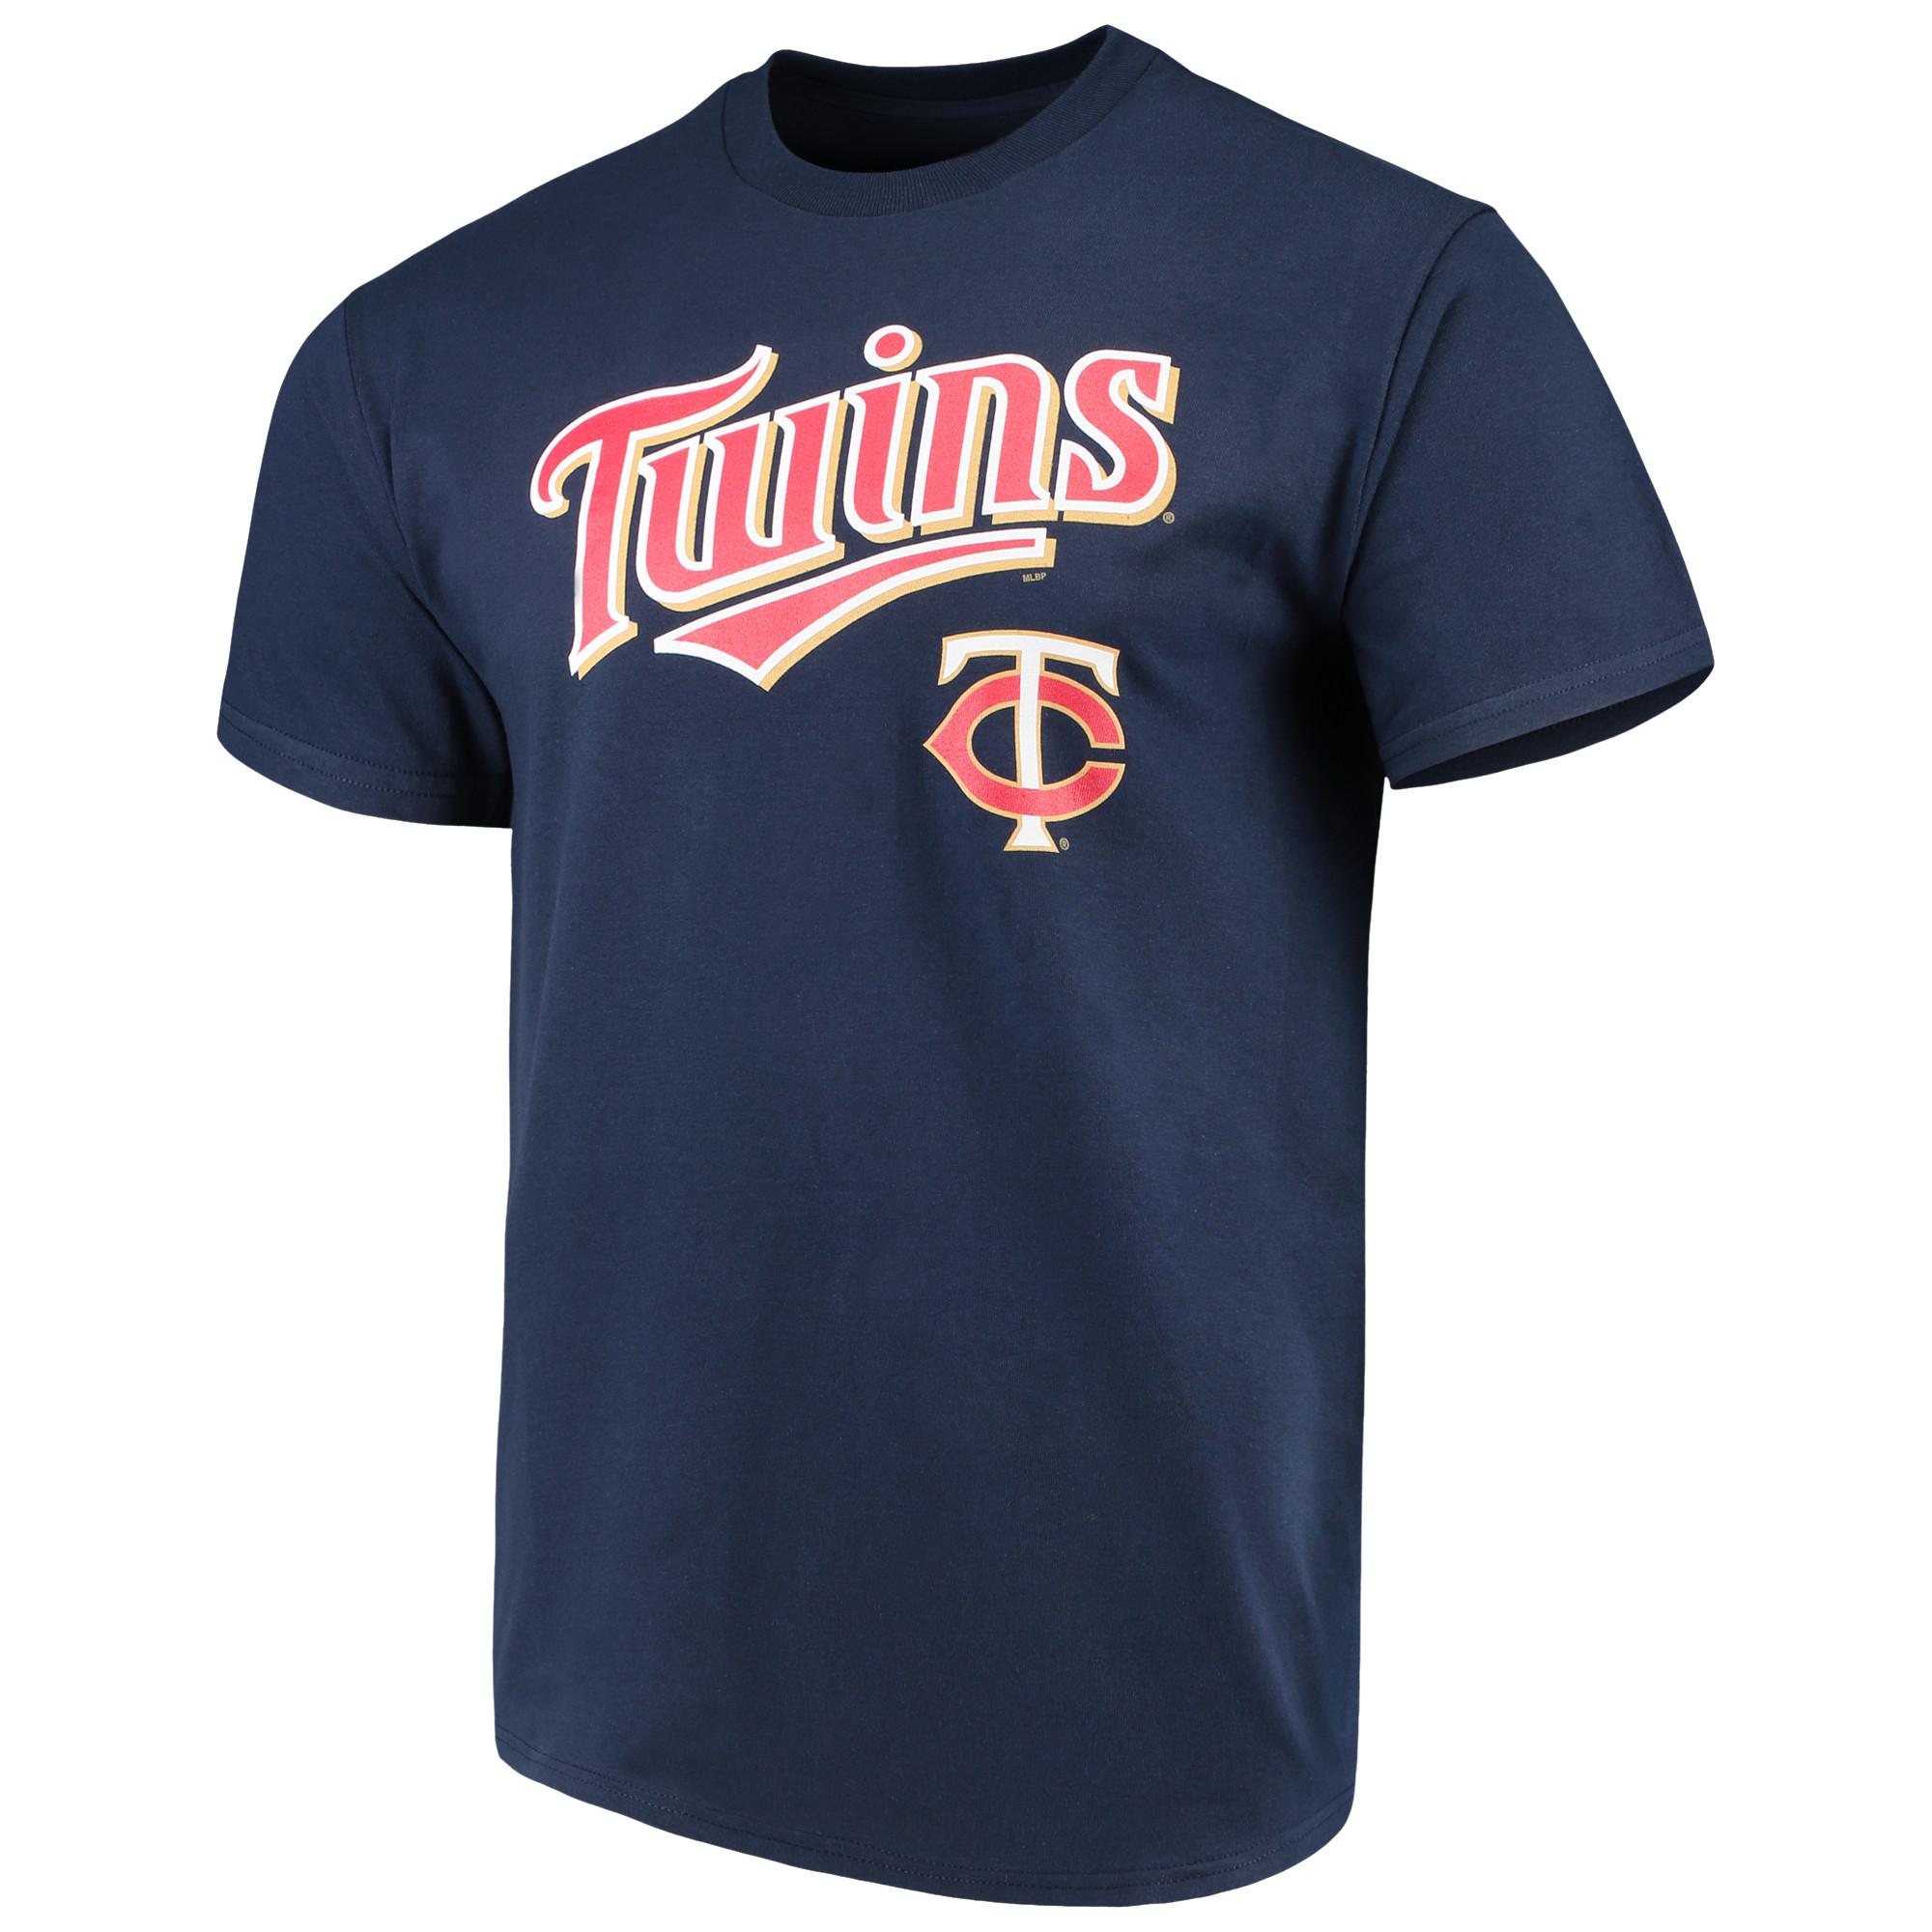 Men's Majestic Navy Minnesota Twins Bigger Series Sweep T-Shirt